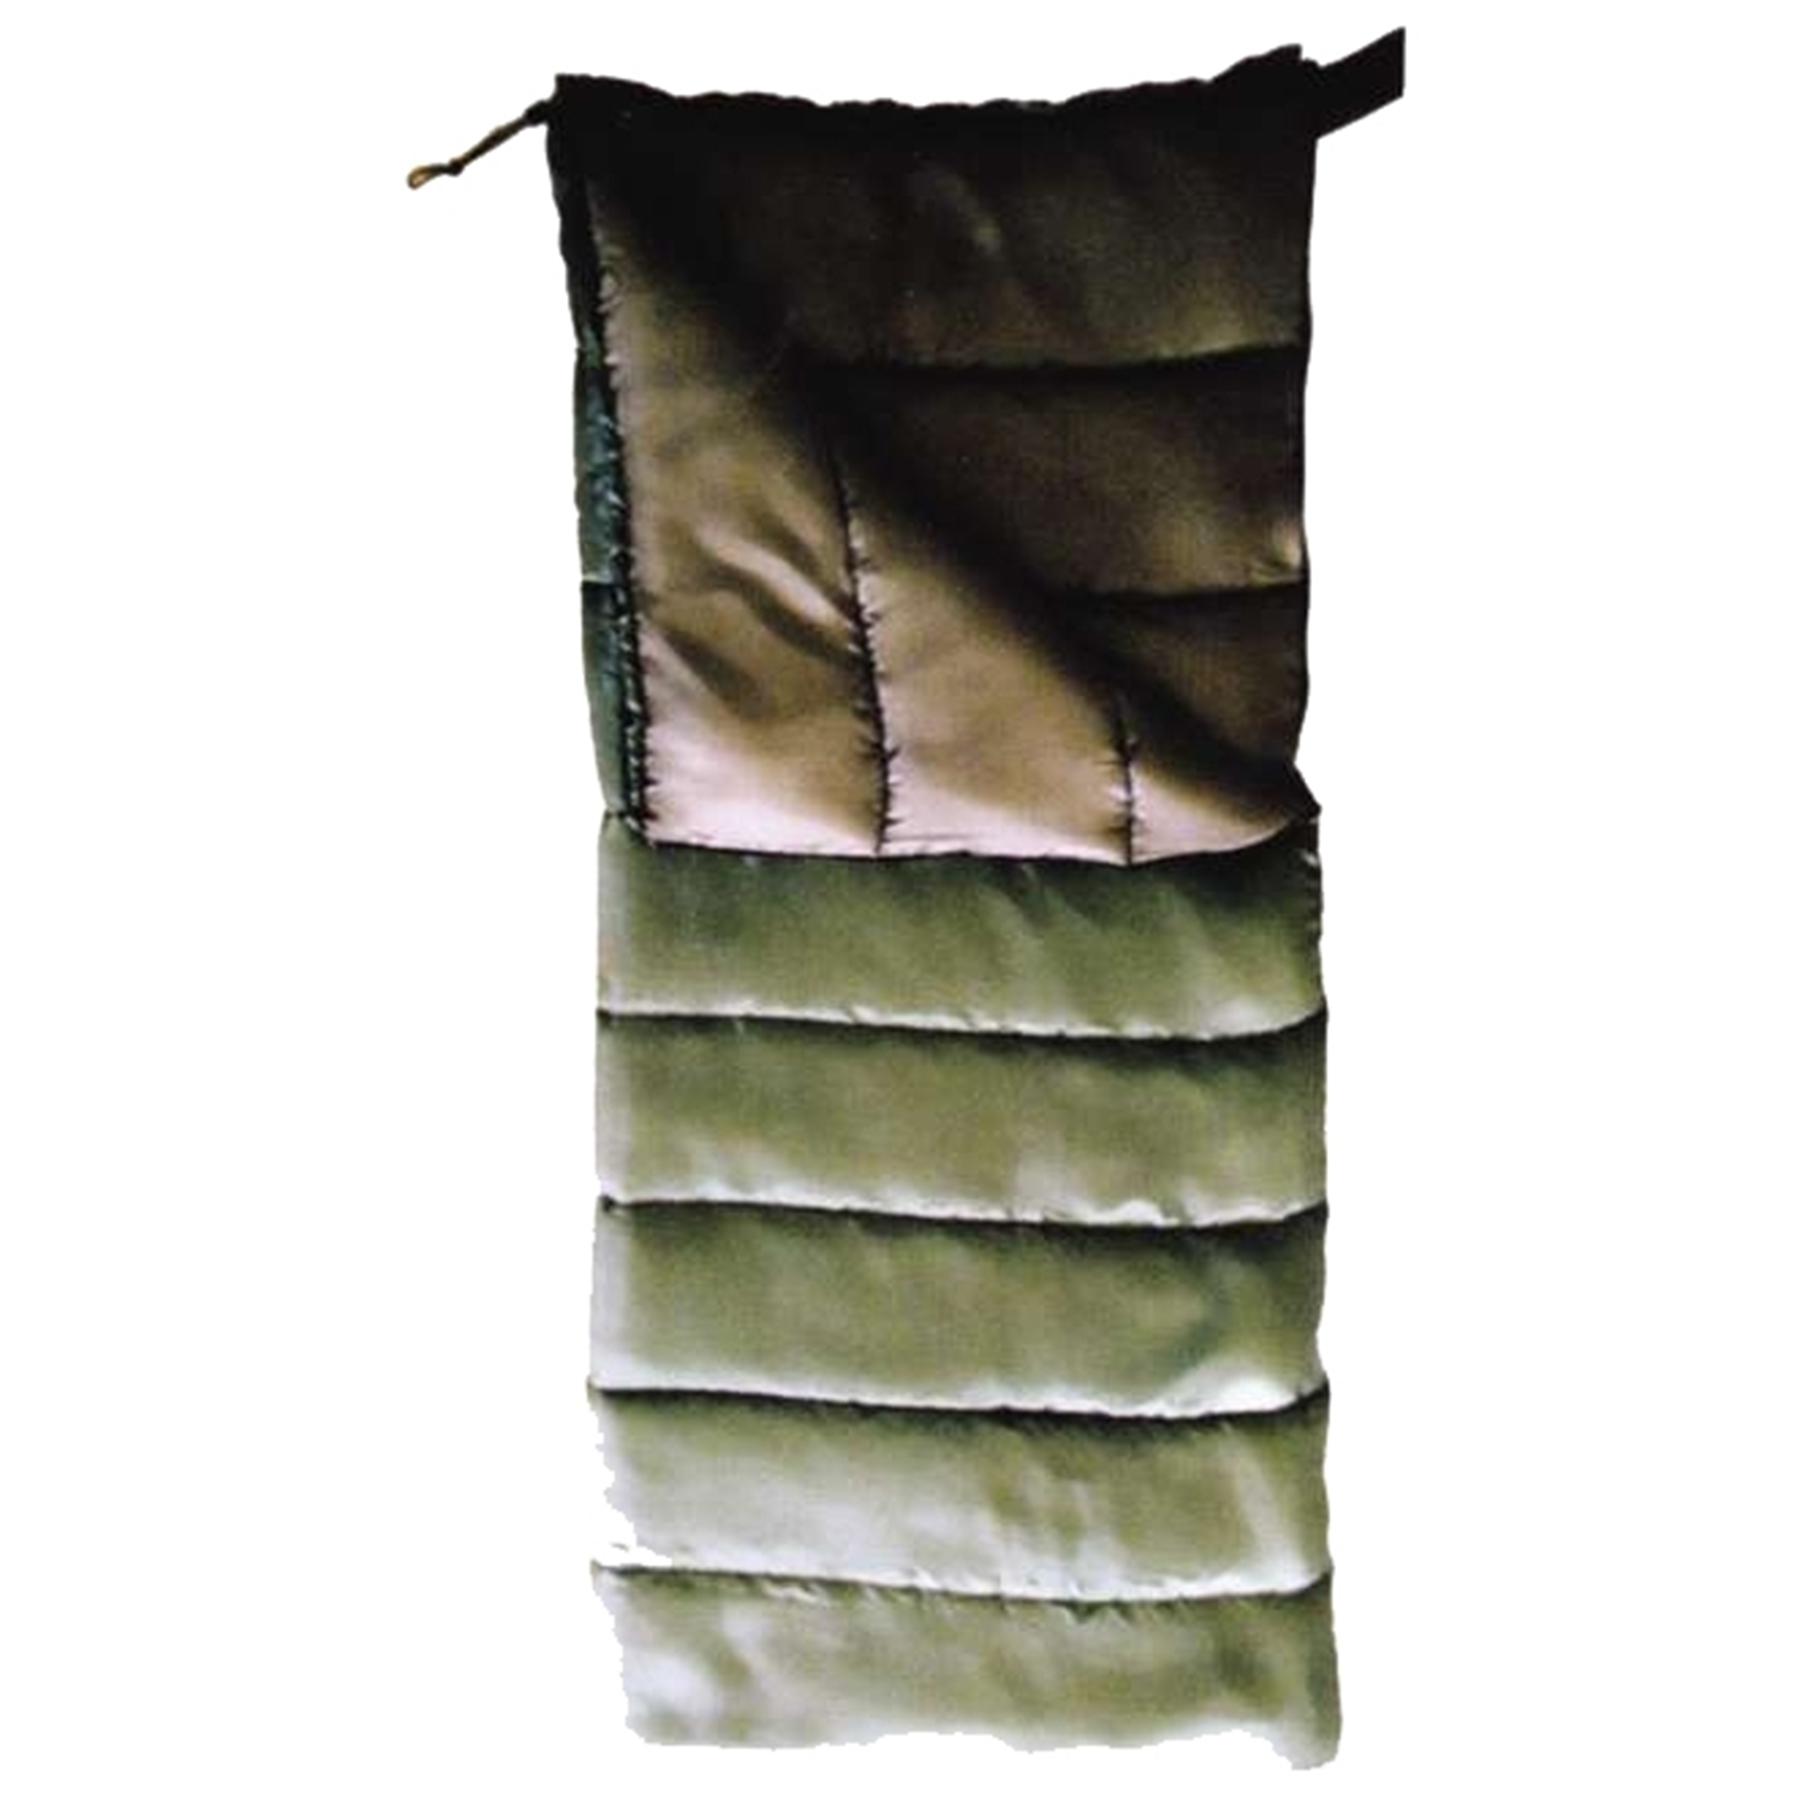 Спальник-одеяло Totem Woodcock 190*73см Hollofiber оливковый TTS-001 (0/+14) левый L